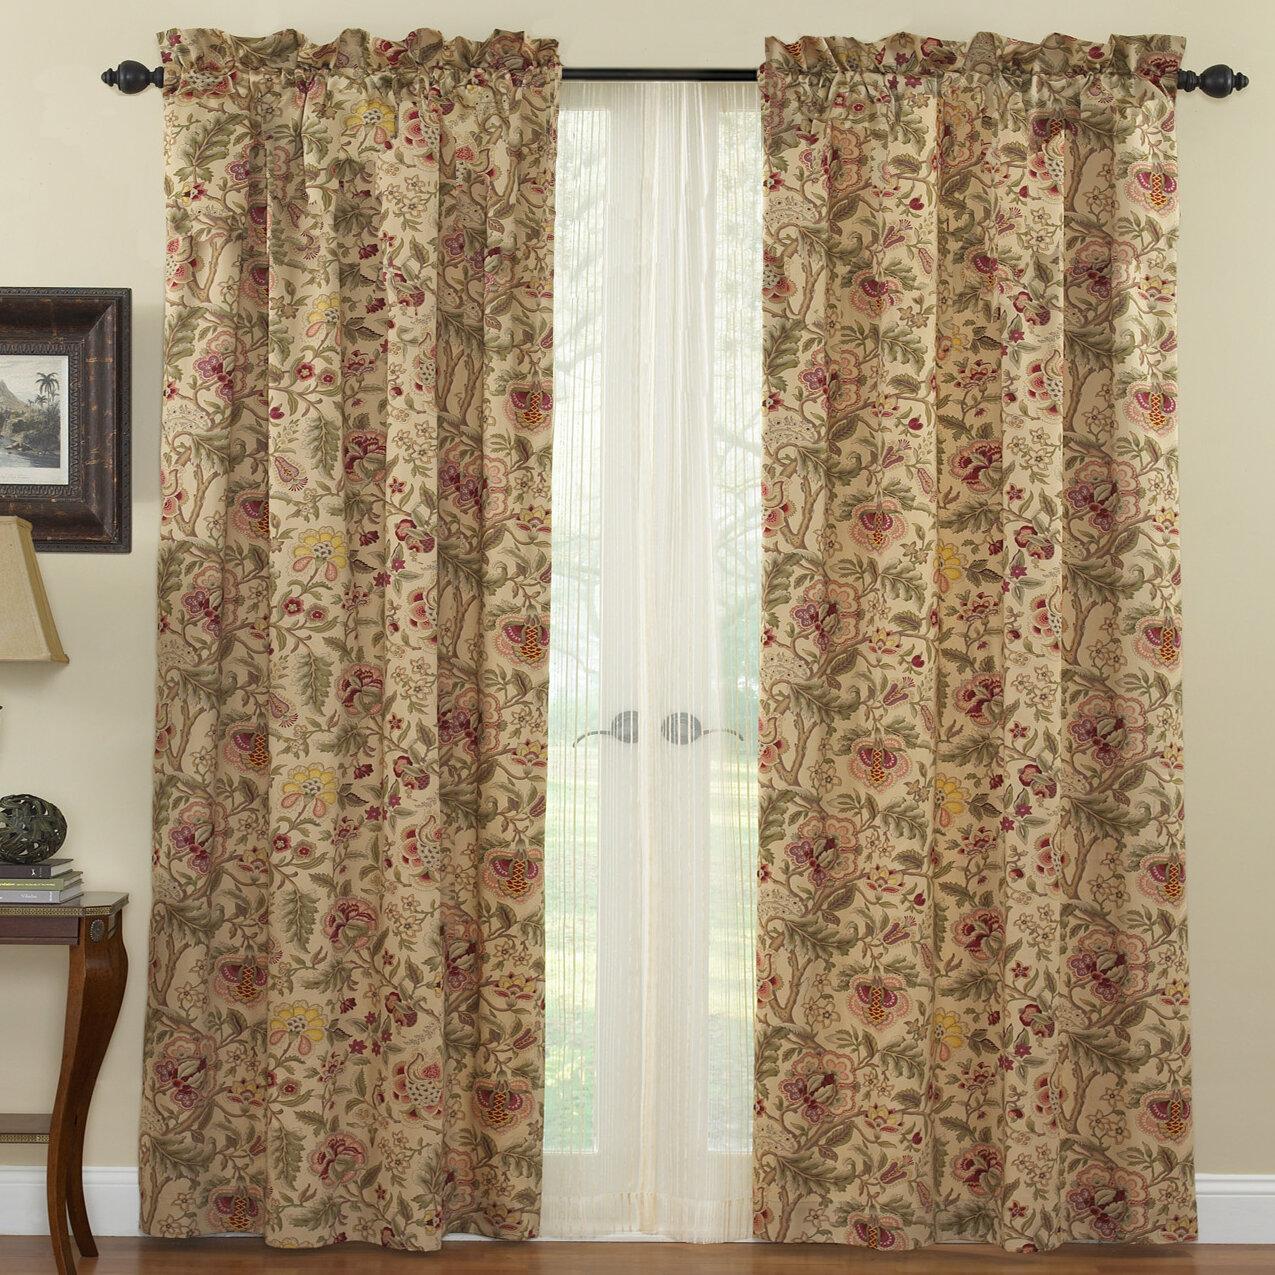 Waverly Imperial Dress Drapery Floral Room Darkening Rod Pocket Curtain Panels Reviews Wayfair